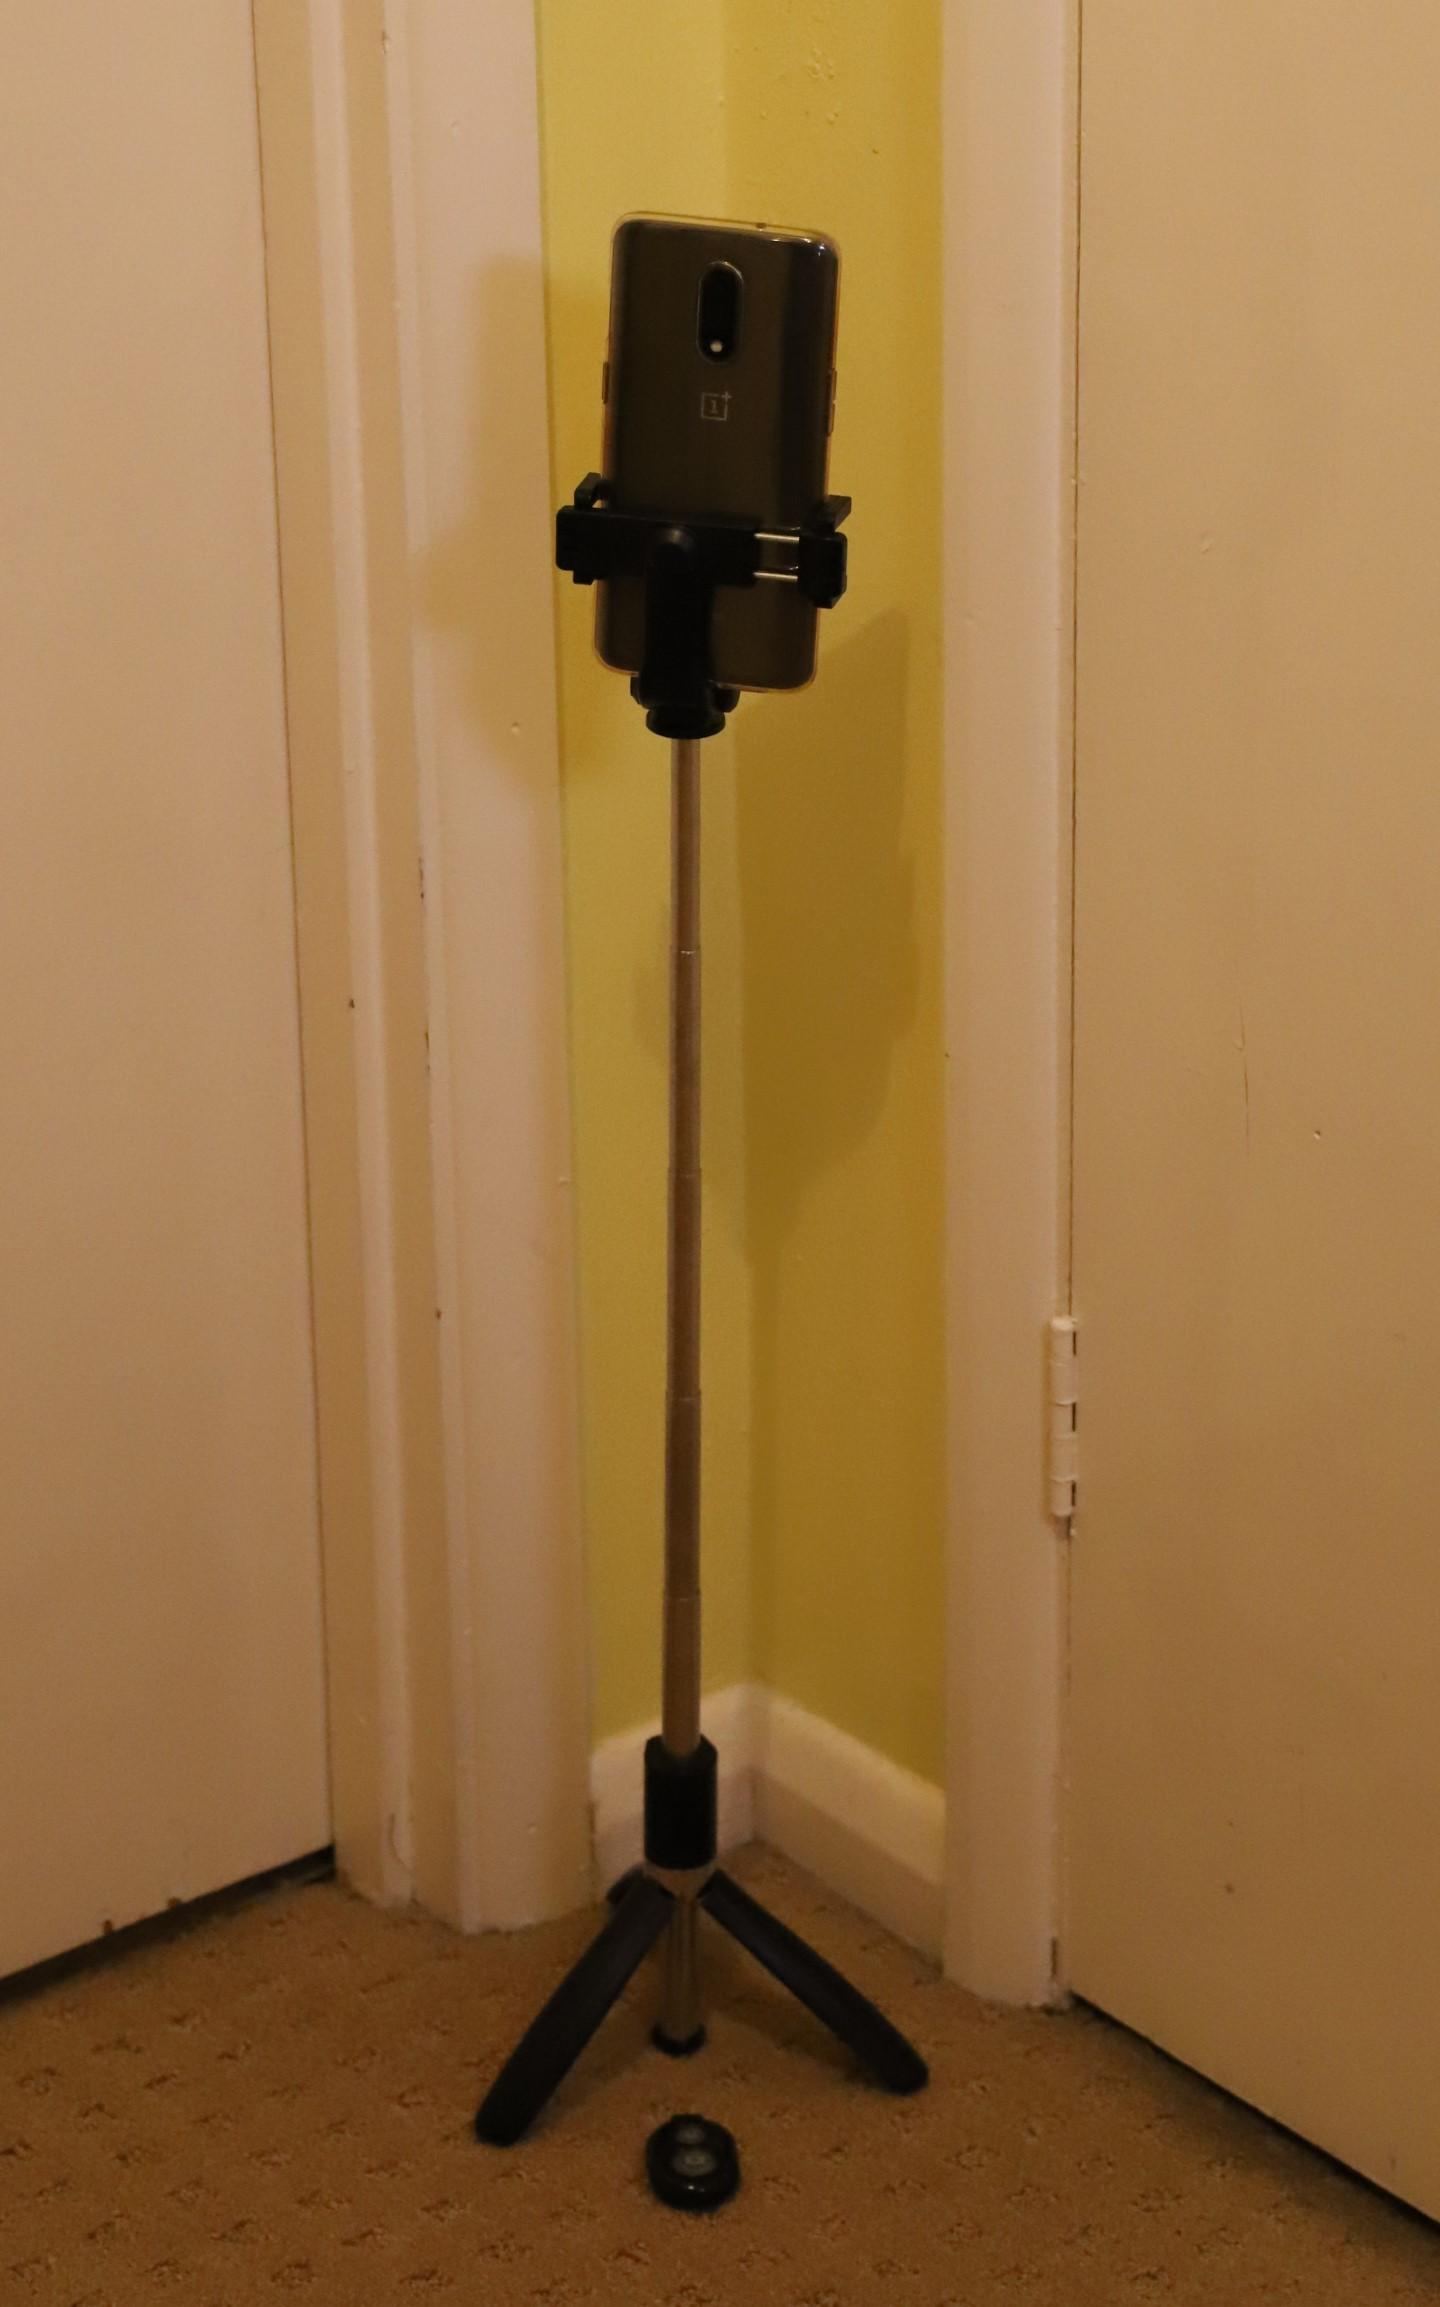 Phone camera + tripod